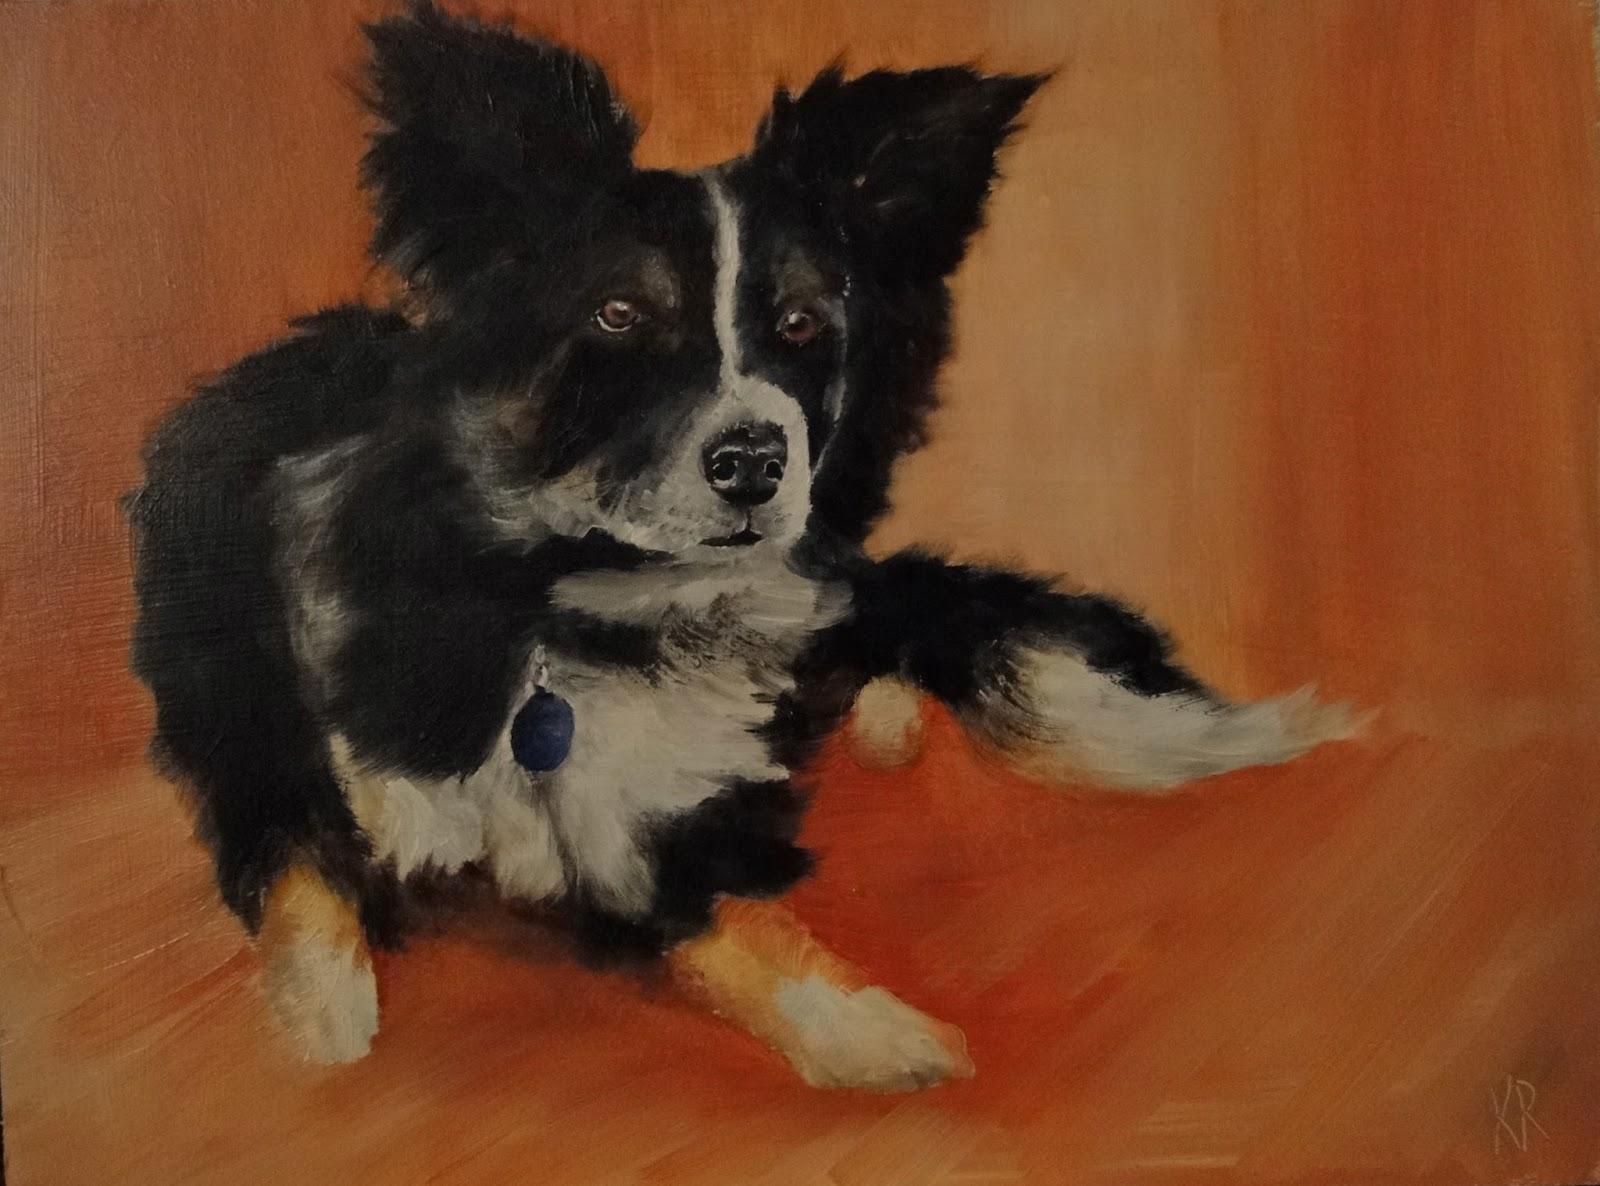 oil painting of a border collie - his distinctive stare. A pet portrait by Karen.